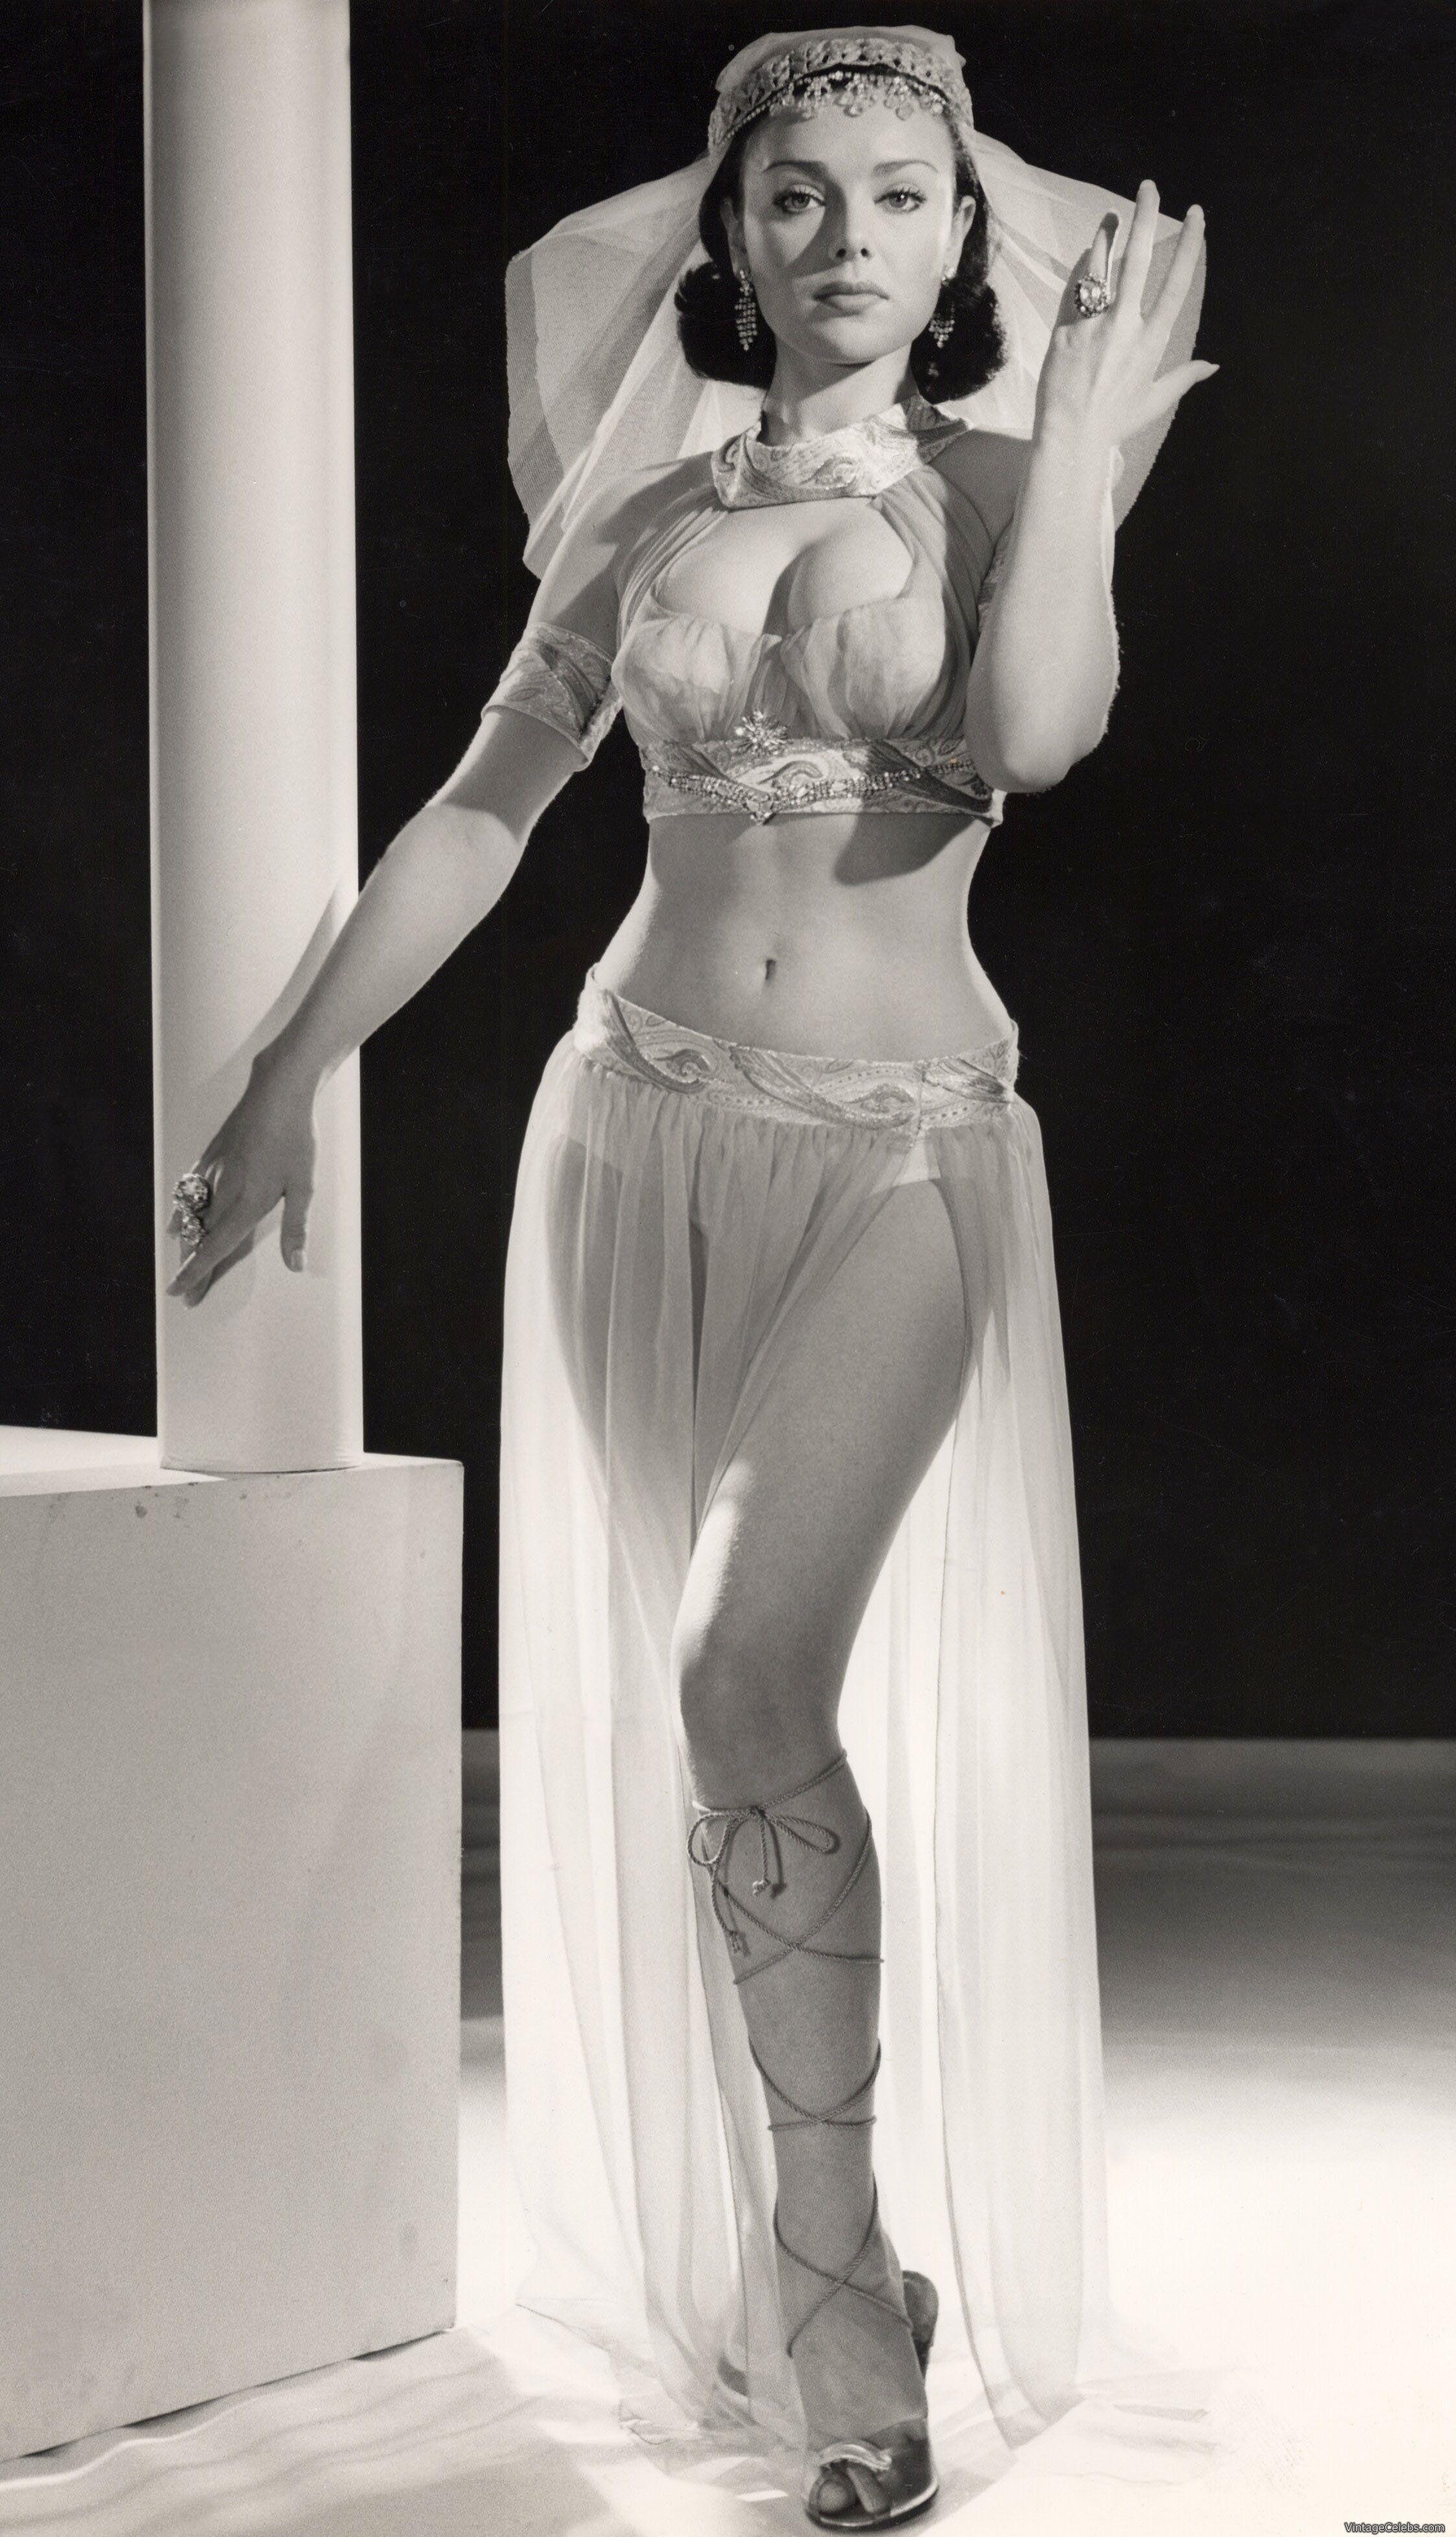 d745b66a2c728b My Harem Girl - Joan Collins | Favorite Females | Joan collins, Joan ...